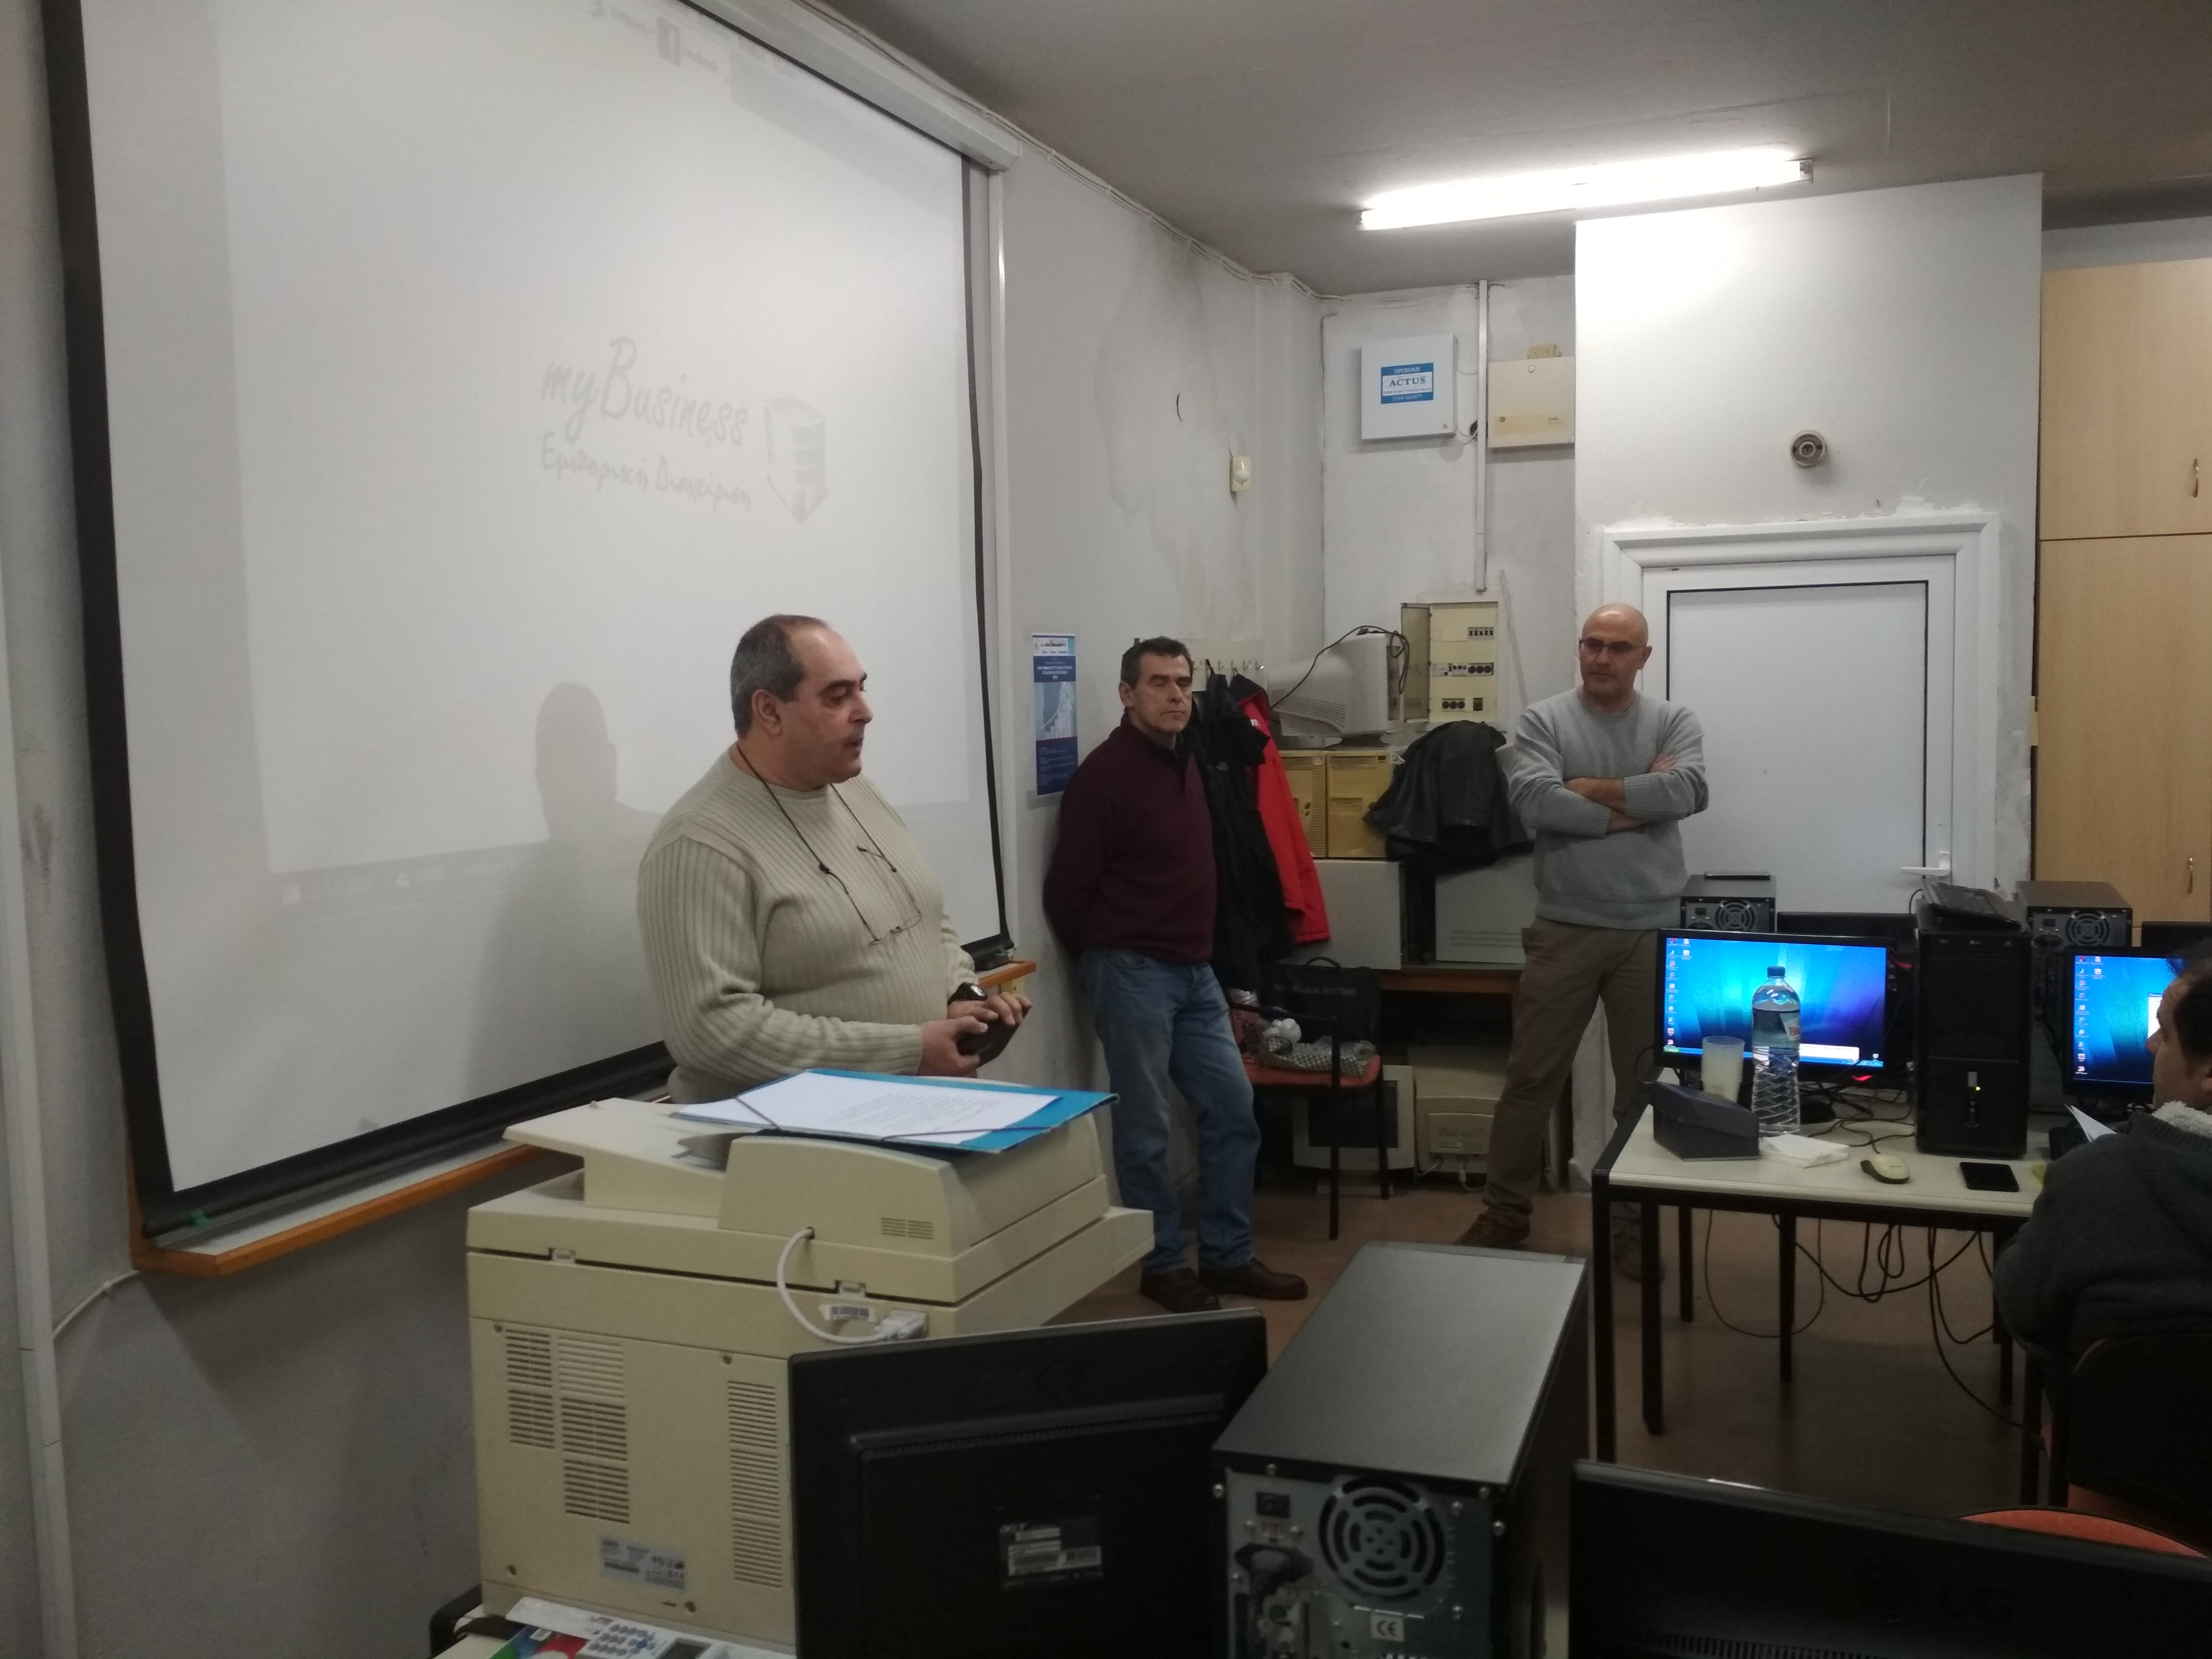 myBusiness ERP, εργαστηριακό μάθημα σε μεταπτυχιακούς φοιτητές του Τ.Ε.Ι Σίνδου